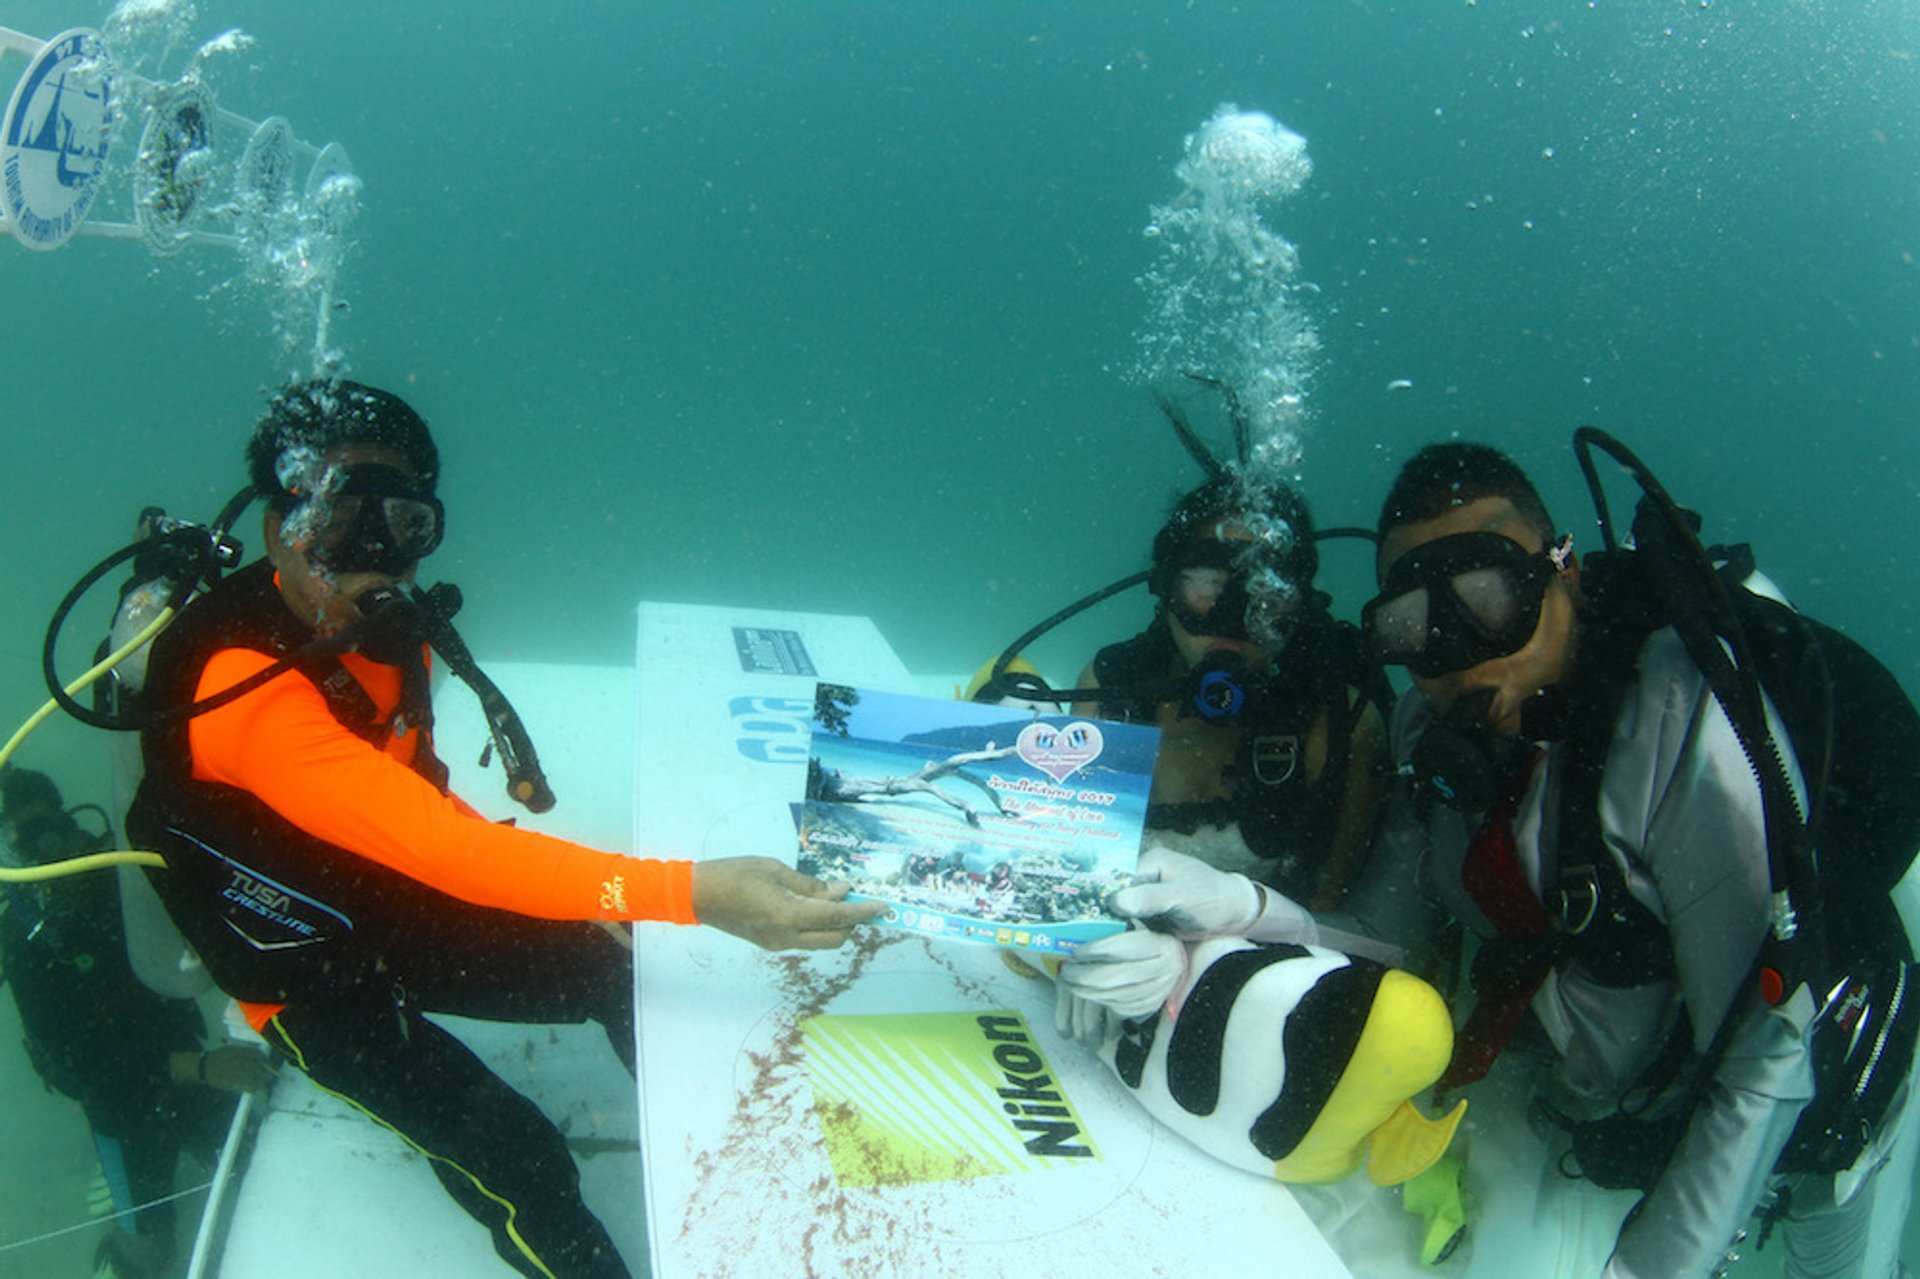 Trang Underwater Wedding Ceremony in Thailand 2020 - Best Time